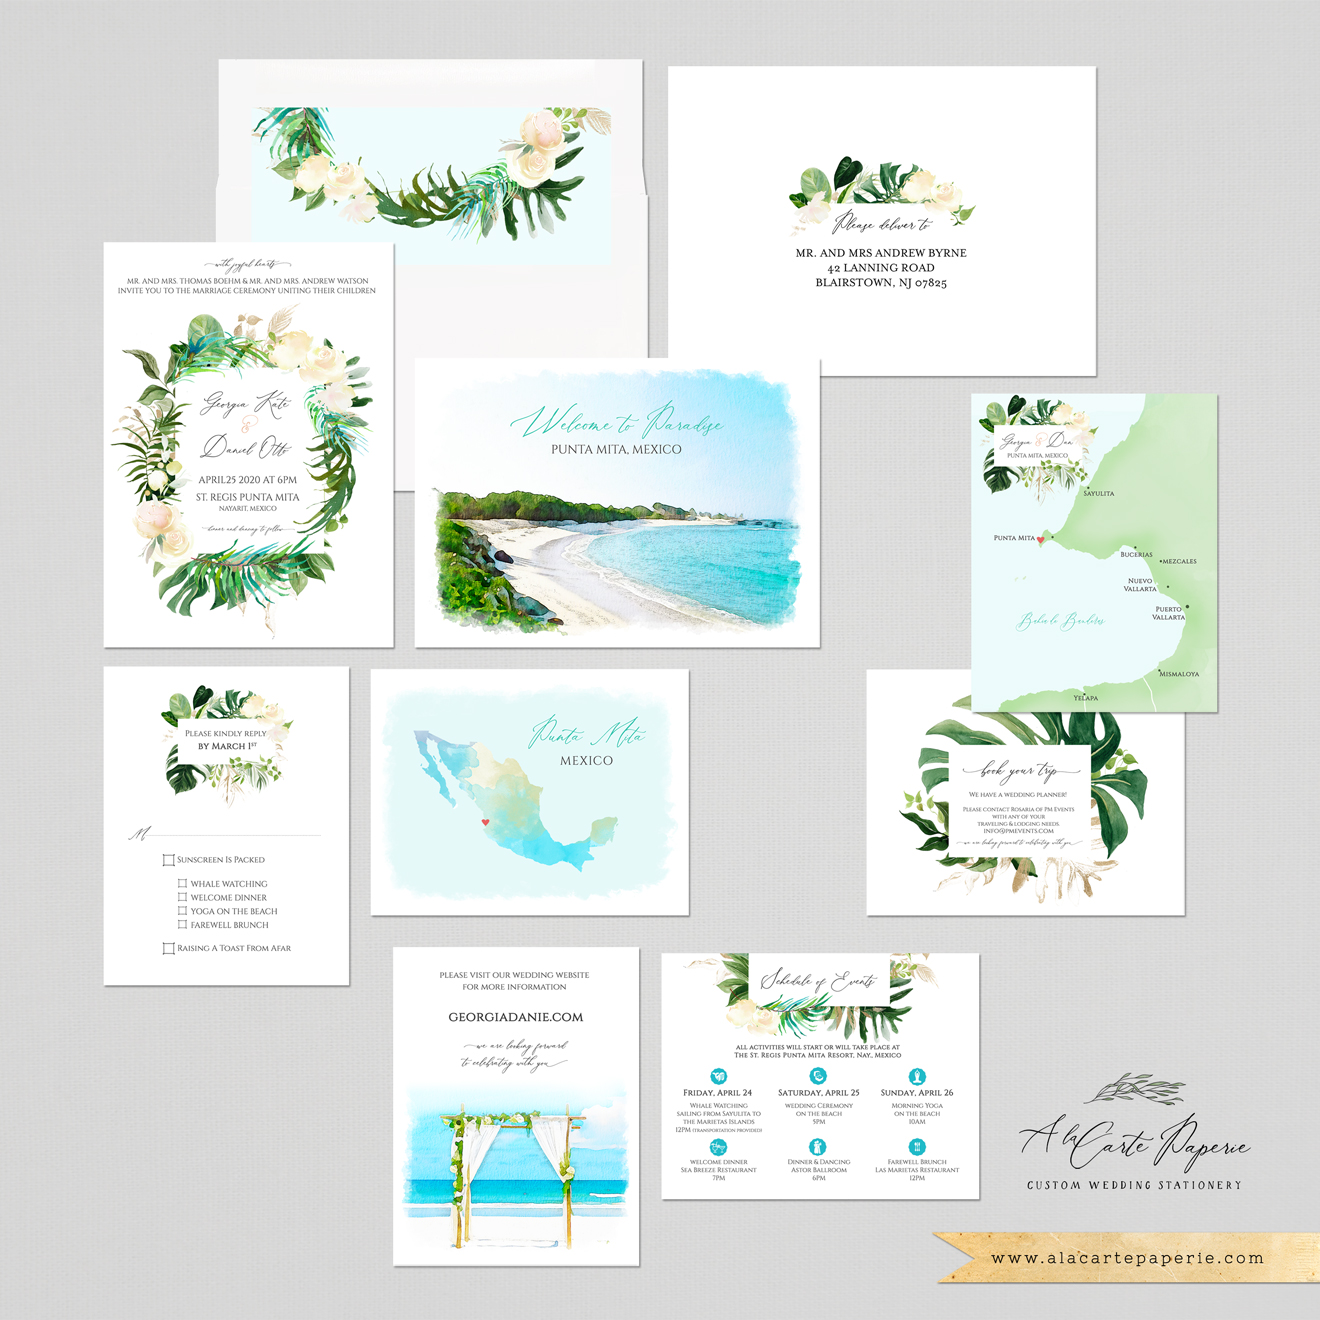 Montreal Wedding Invitations: CUSTOM DESIGN